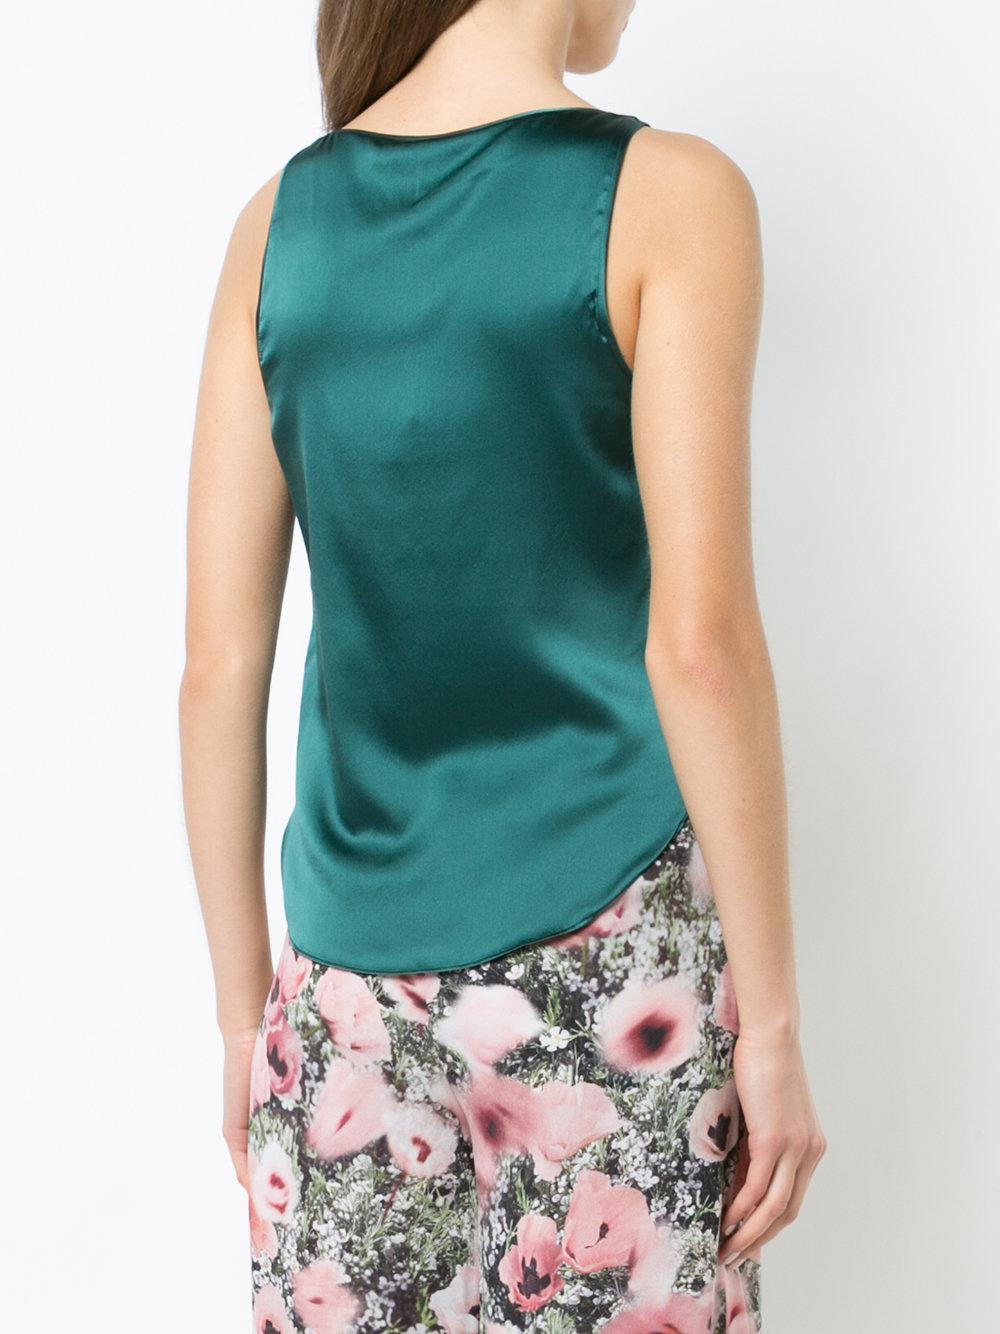 Fleur du Mal Satin Scoop Neck Cami Top in Green